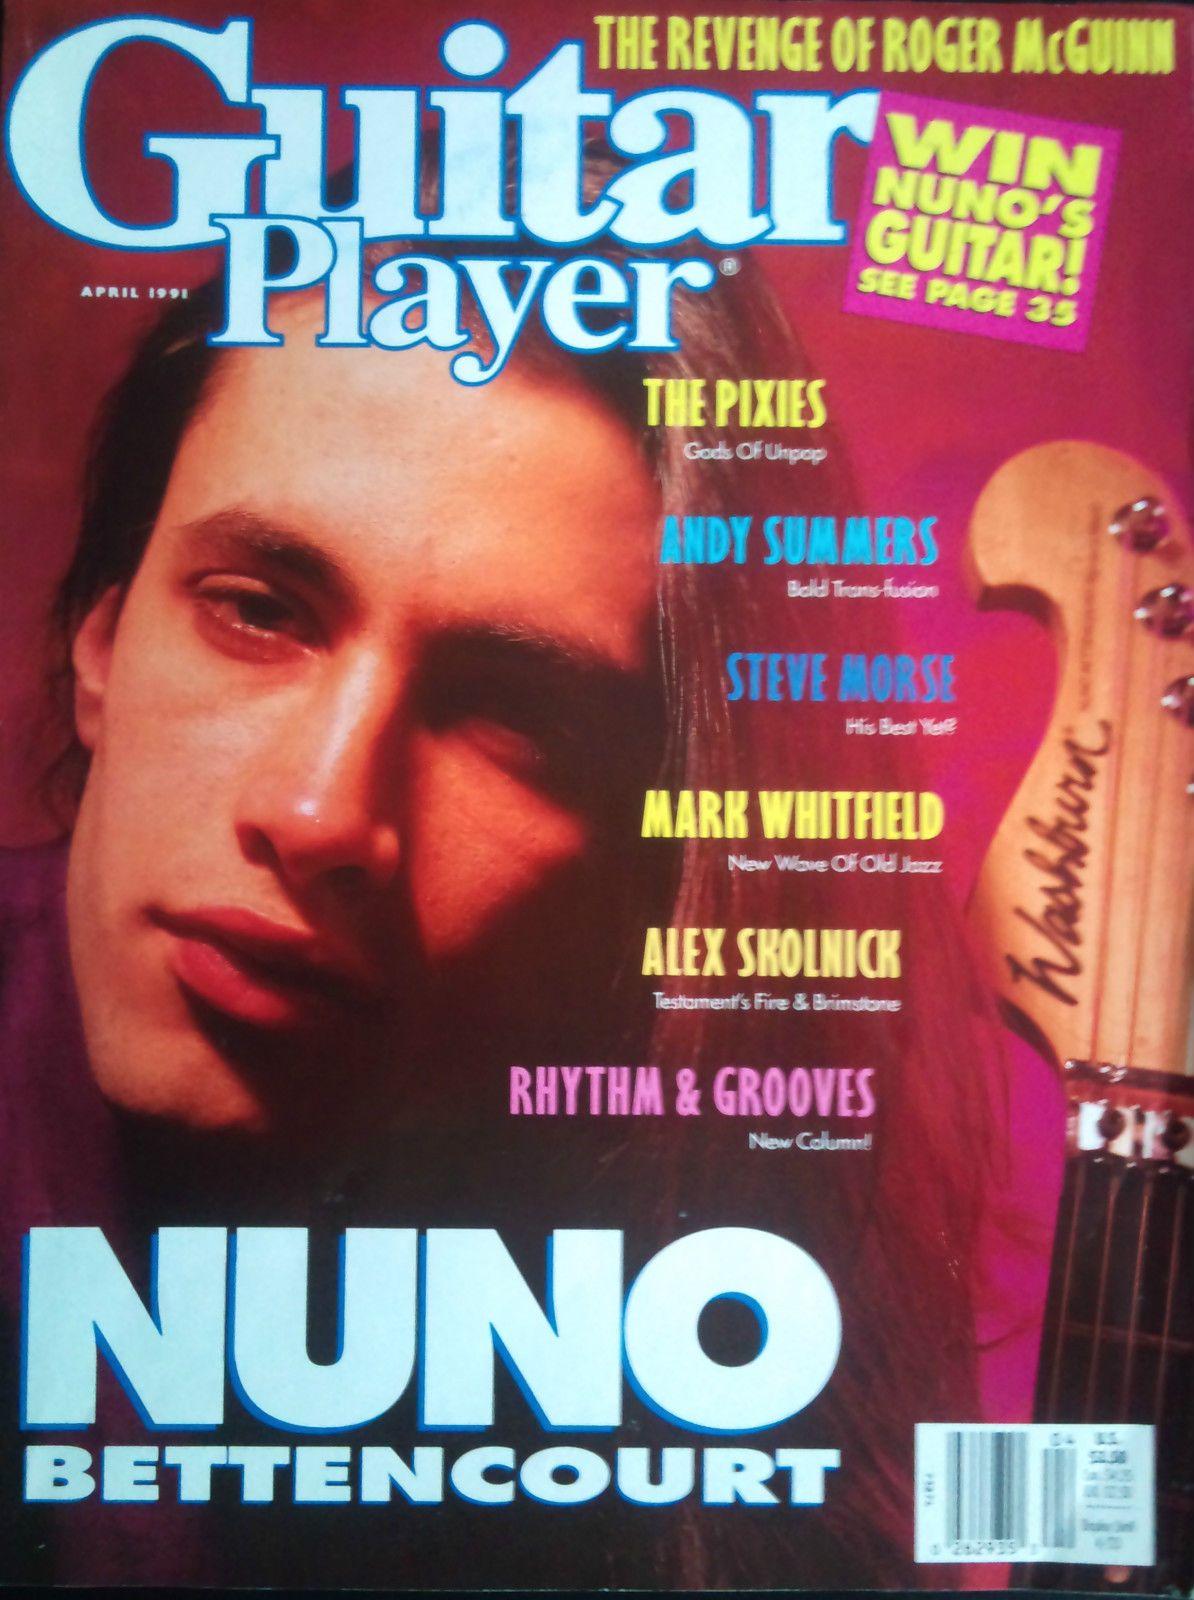 Nuno Bettencourt - Guitar Player April 1991